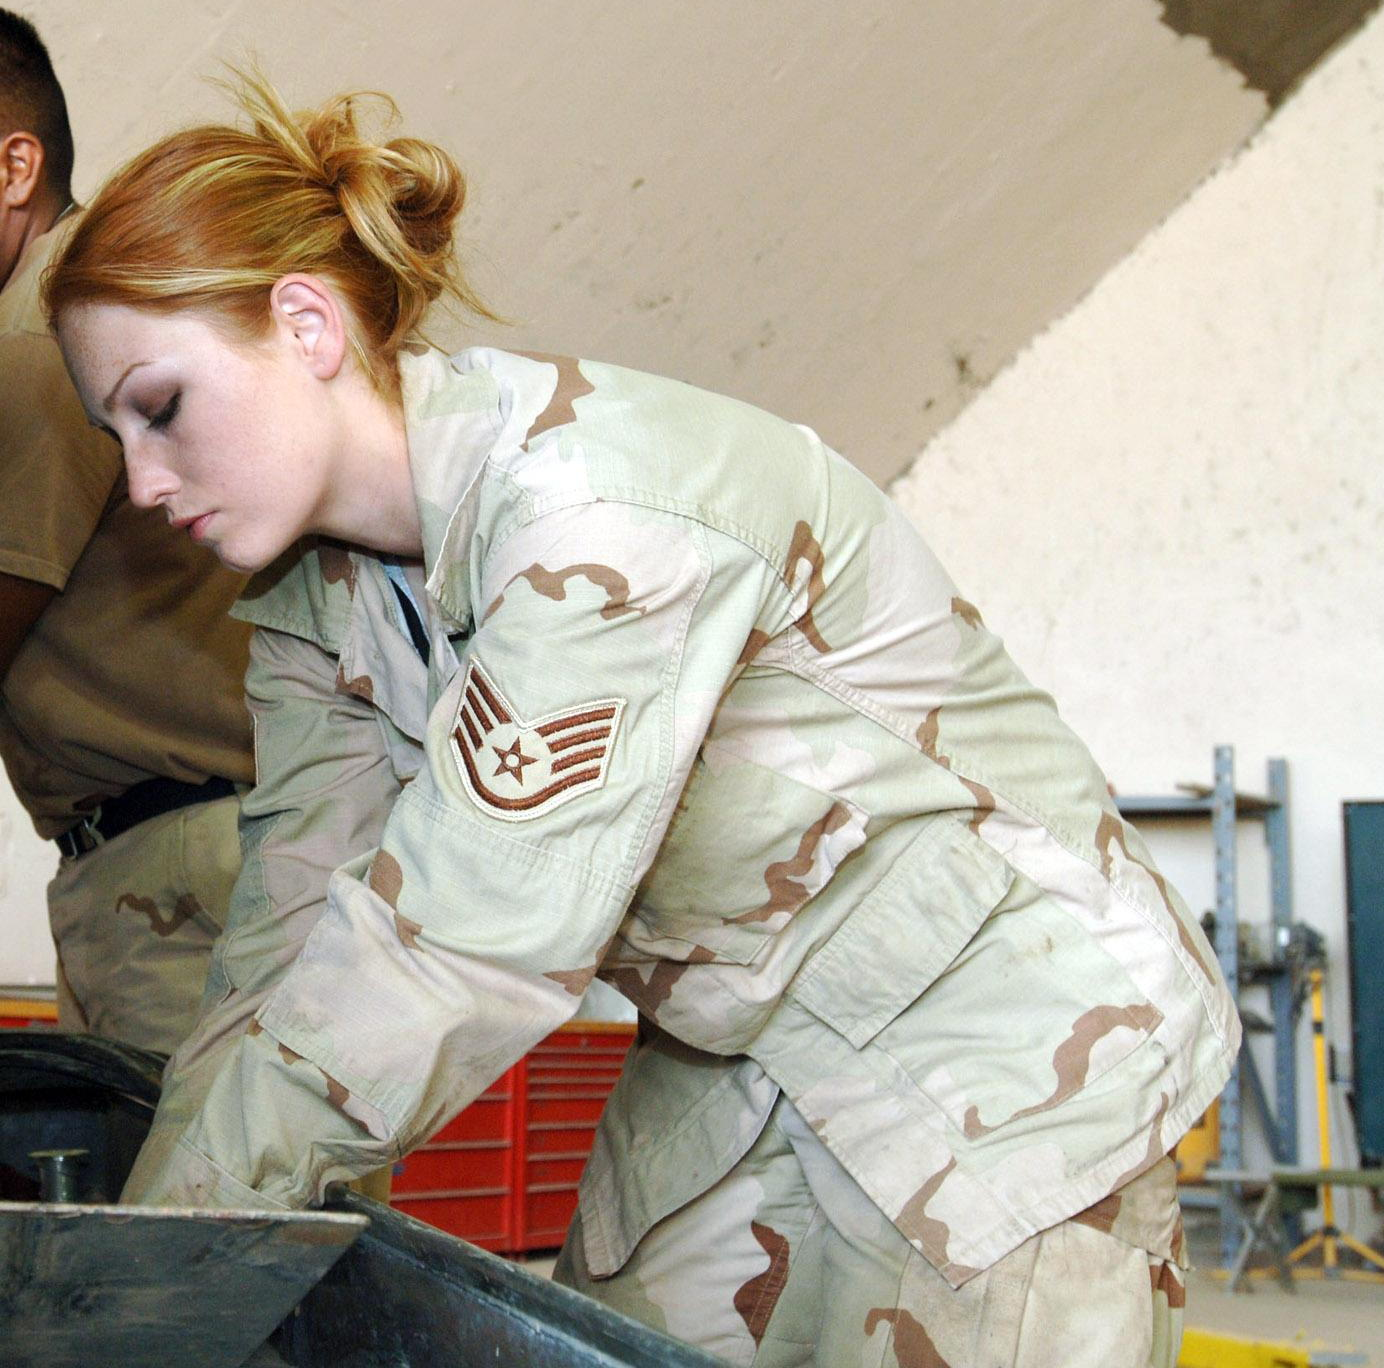 Women Soldiers Wallpaper 1384x1368 Women, Soldiers, Uniforms, Military ...